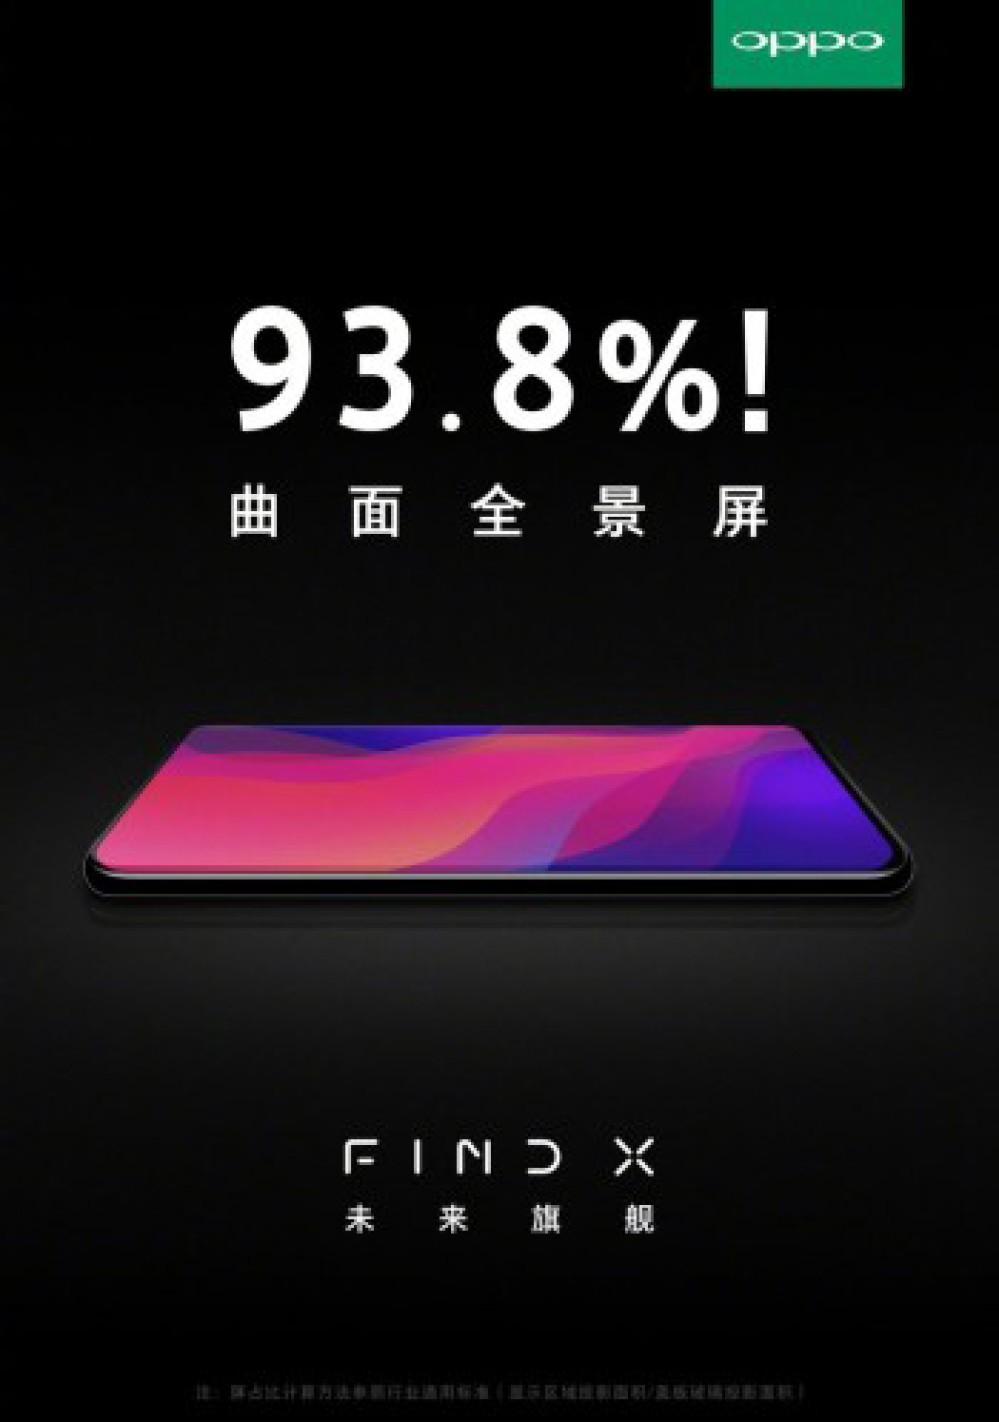 Oppo Find X: Έρχεται με οθόνη που καταλαμβάνει το 93.8% της πρόσοψης και μια ενδιαφέρουσα καινοτομία [Video]